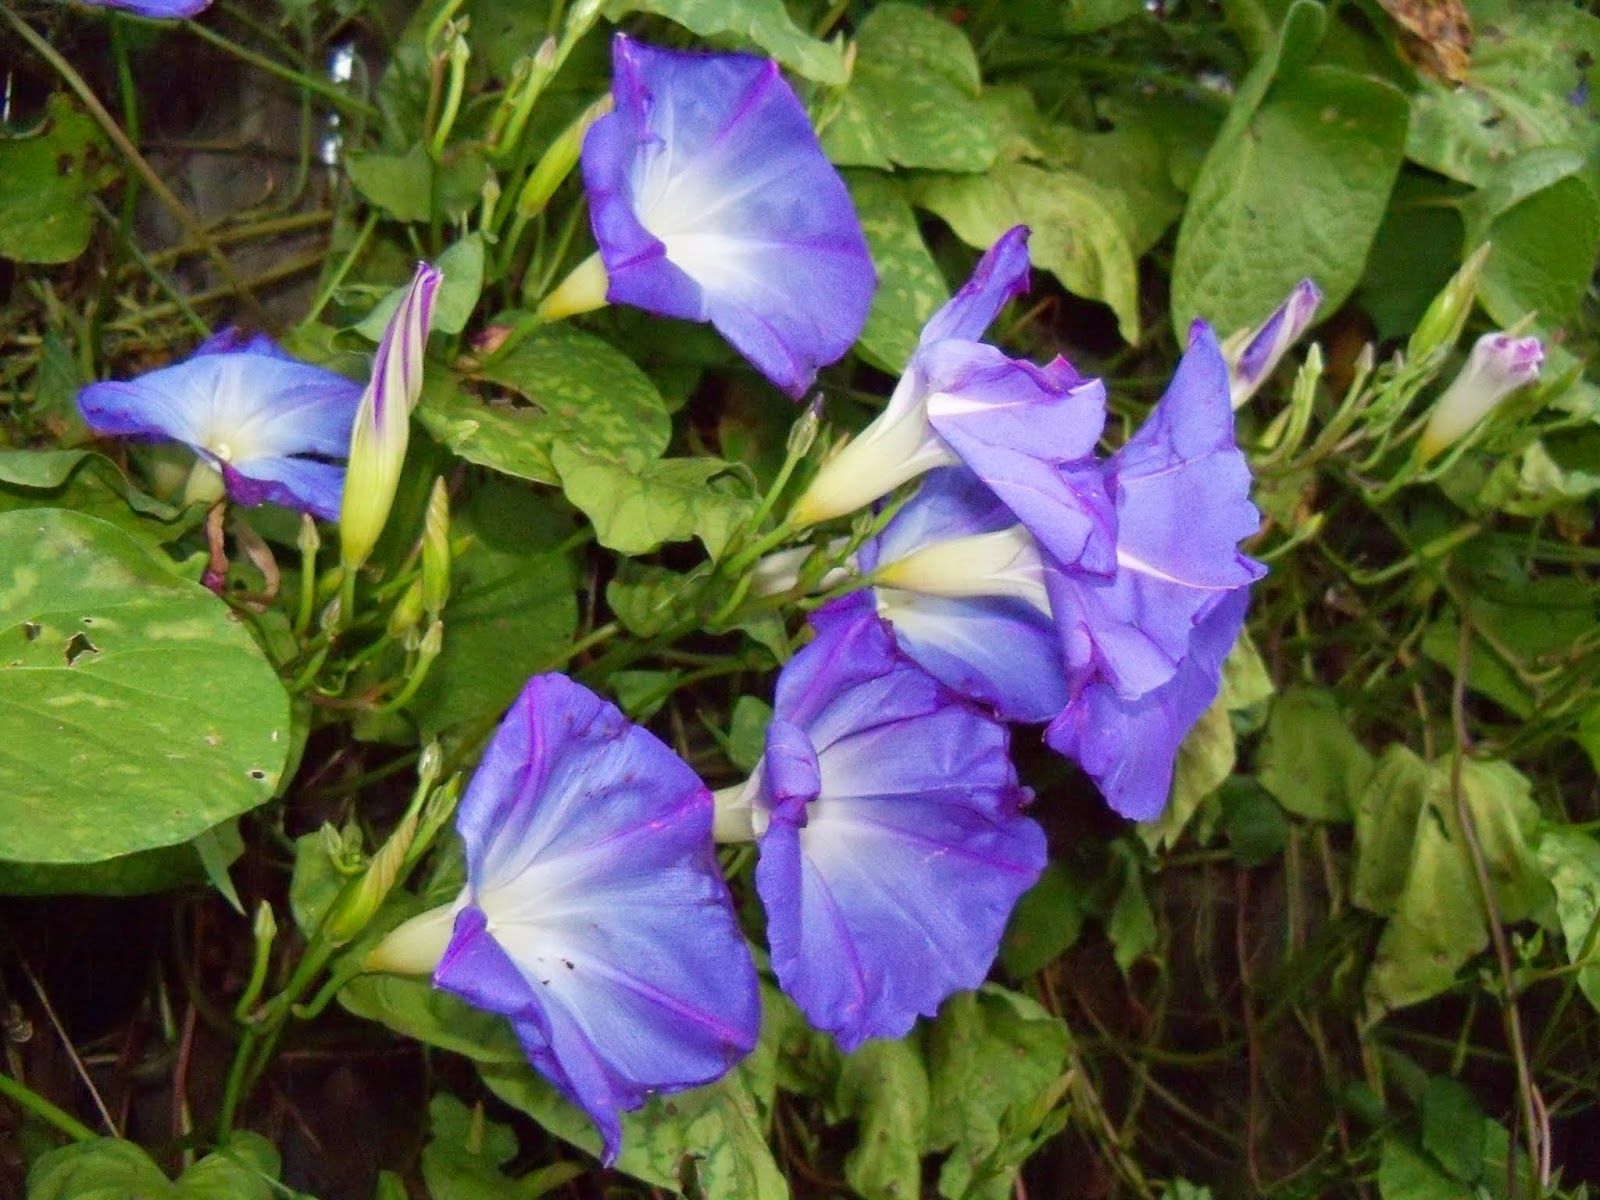 Gardening 2014 - 116_5270.JPG